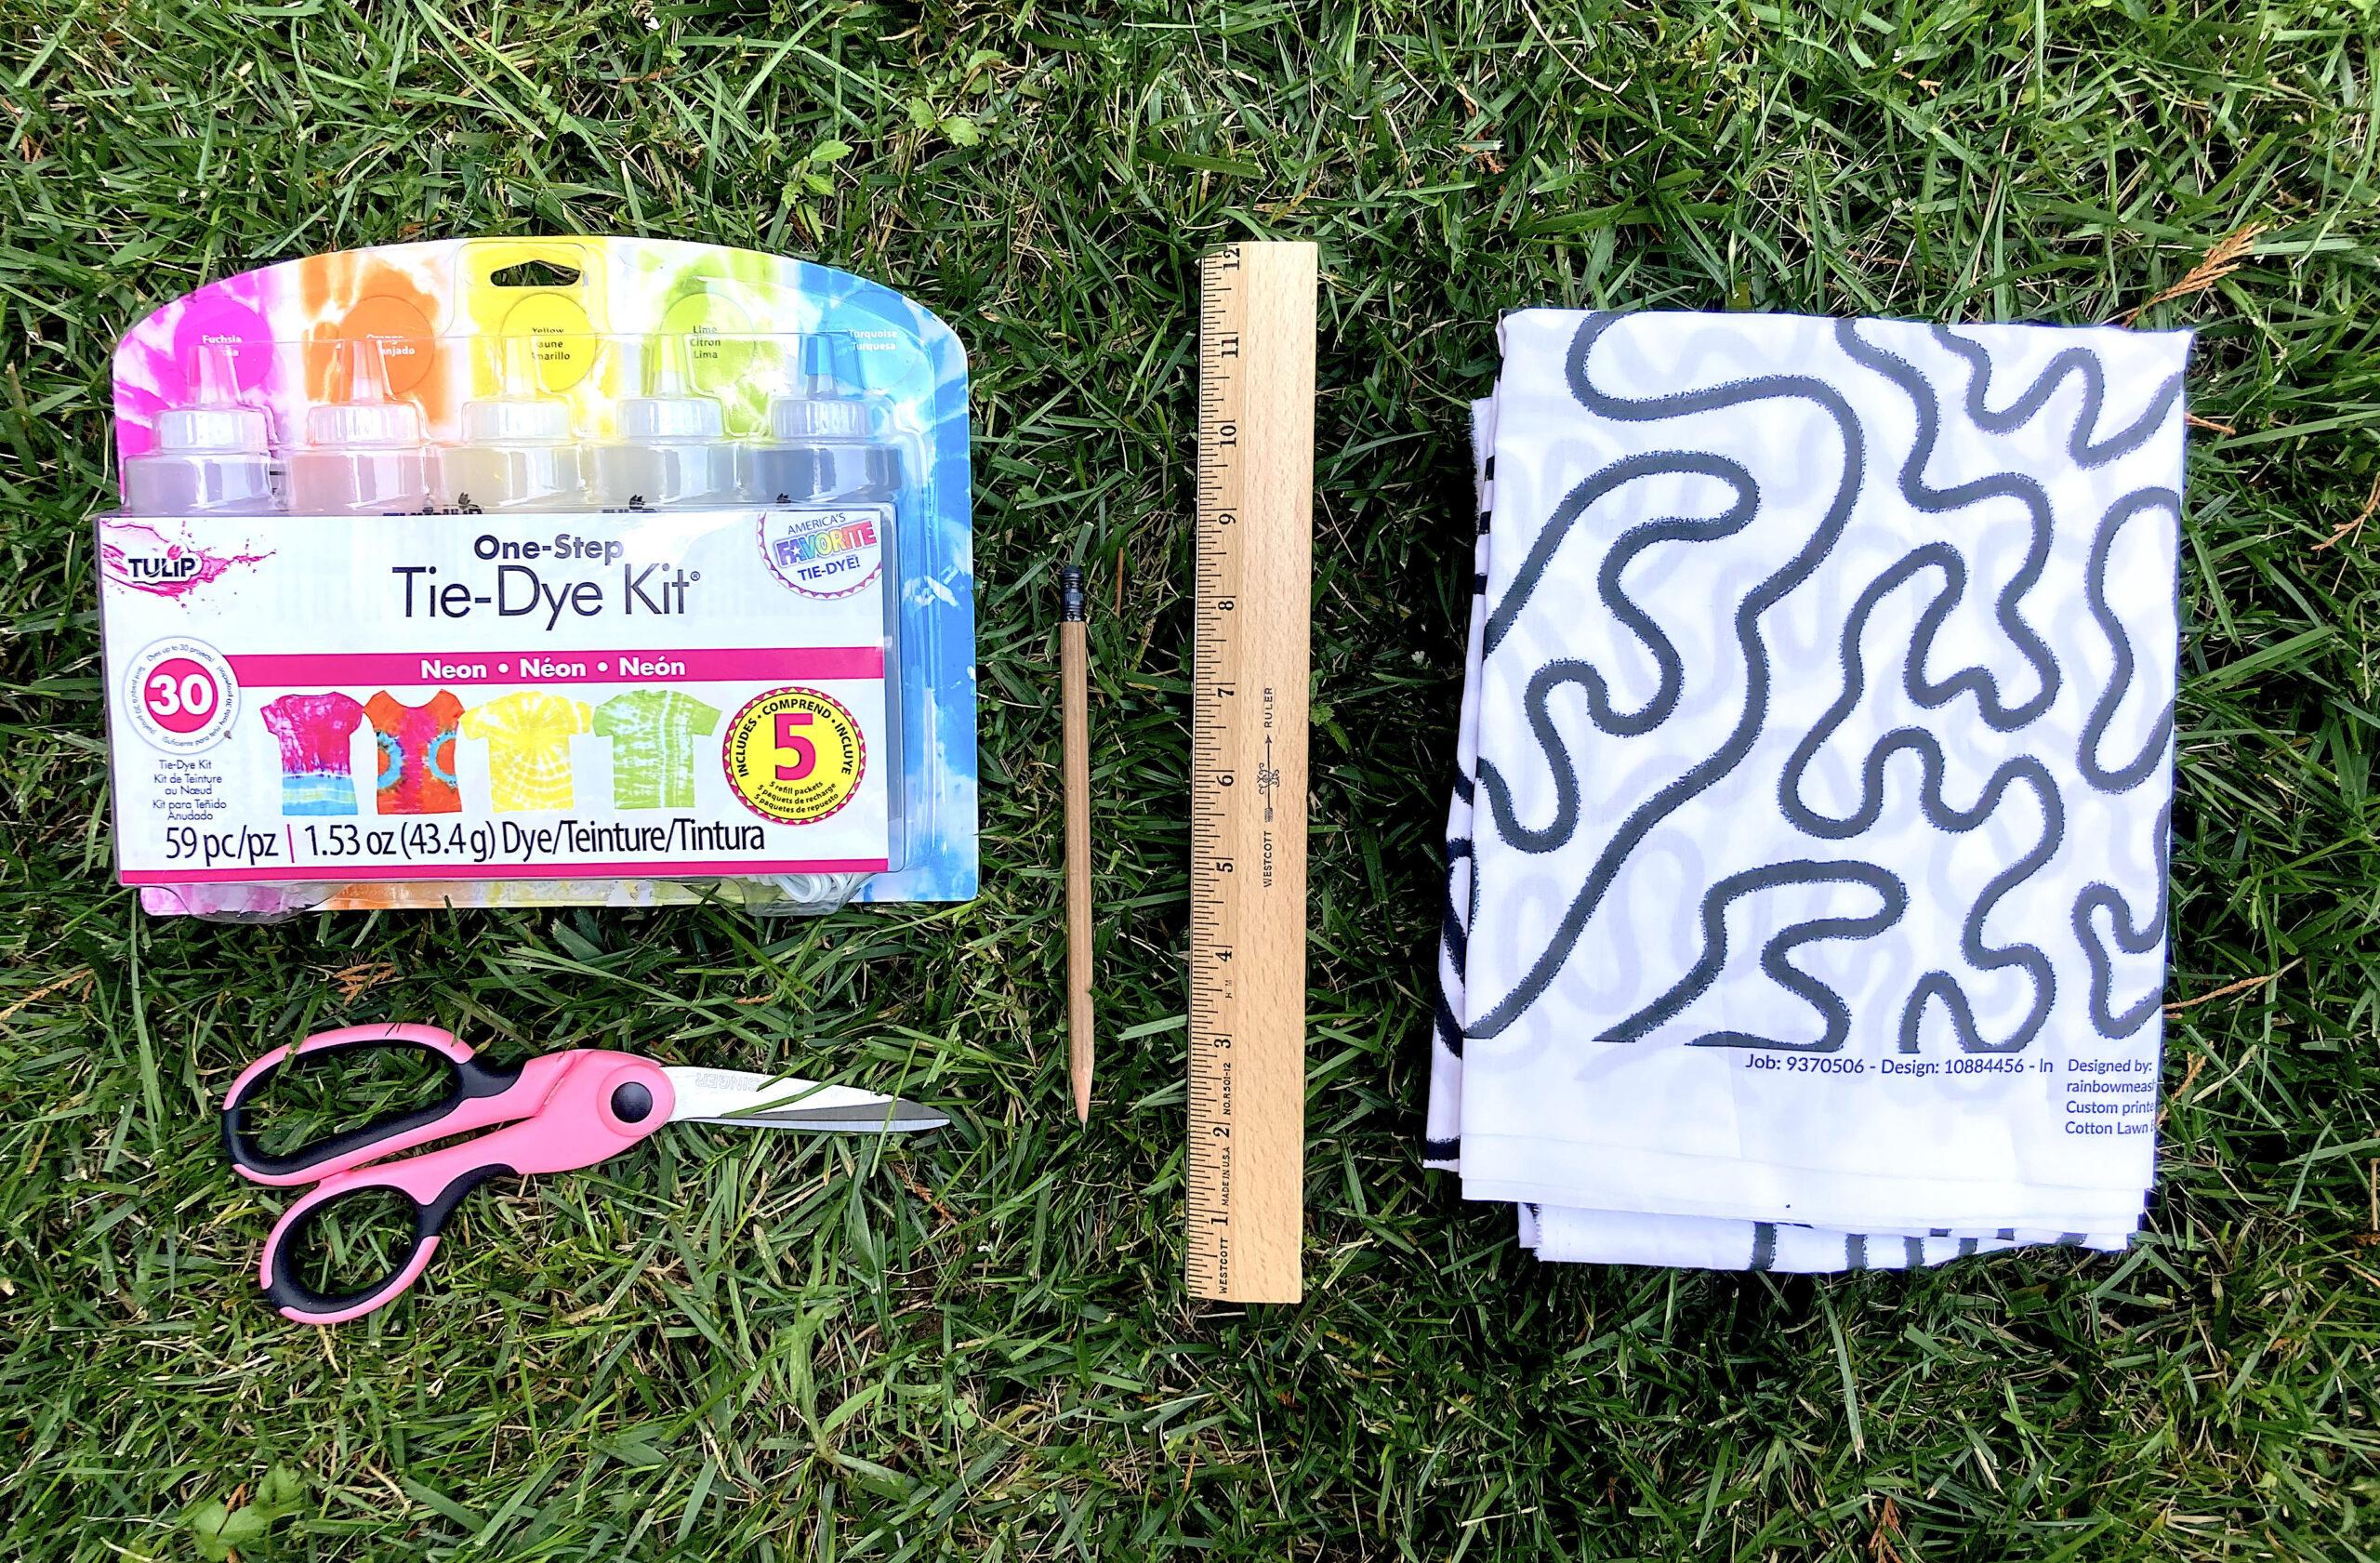 Tie-die bandana supplies: a tie-dye kit, scissors, a pencil, a ruler, and fabric